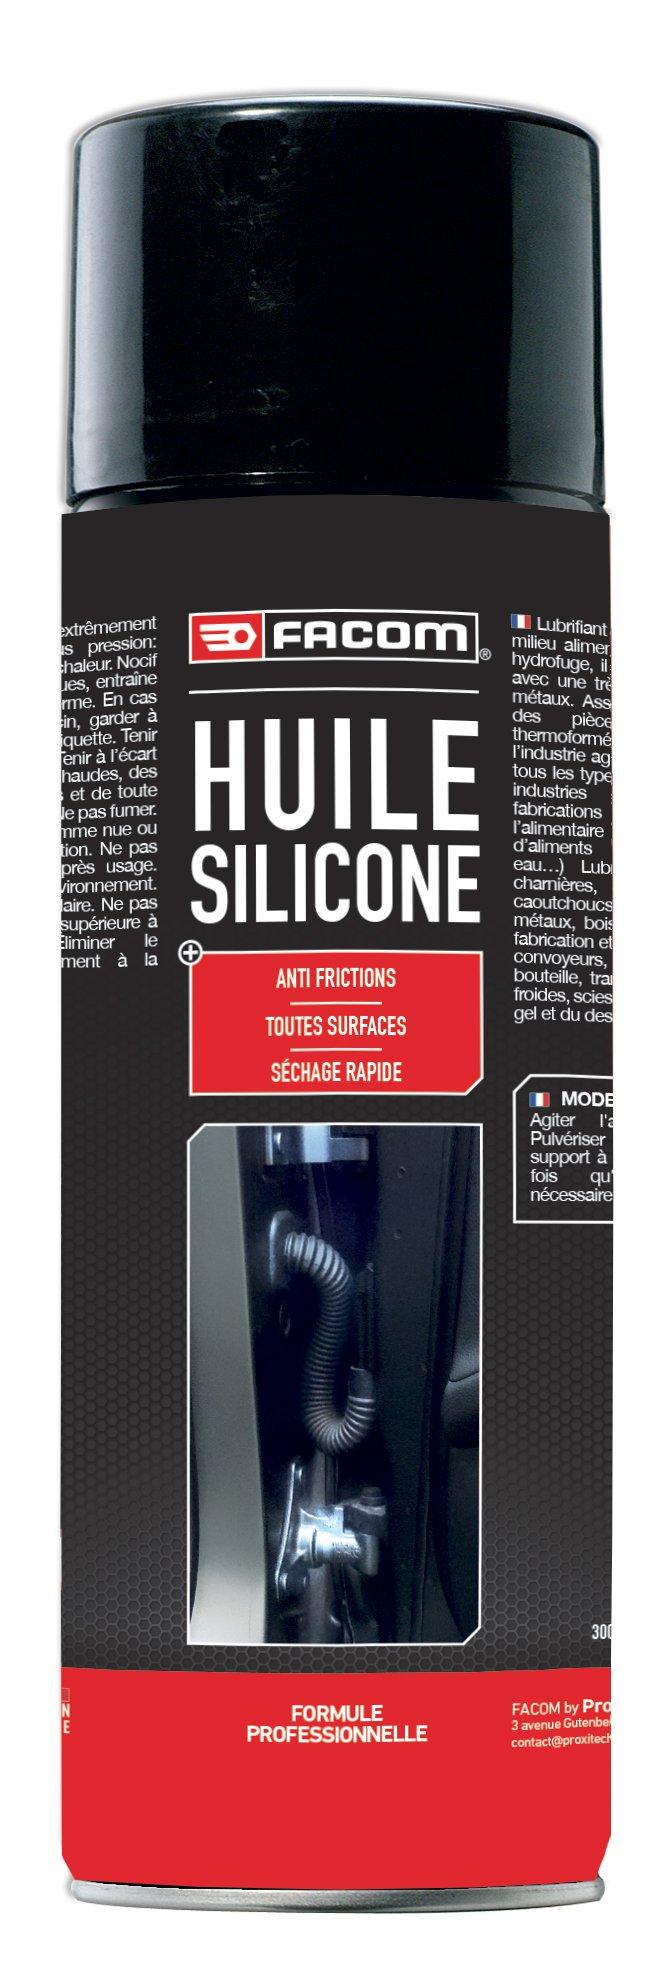 HUILE SILICONE FACOM PRO 300ML